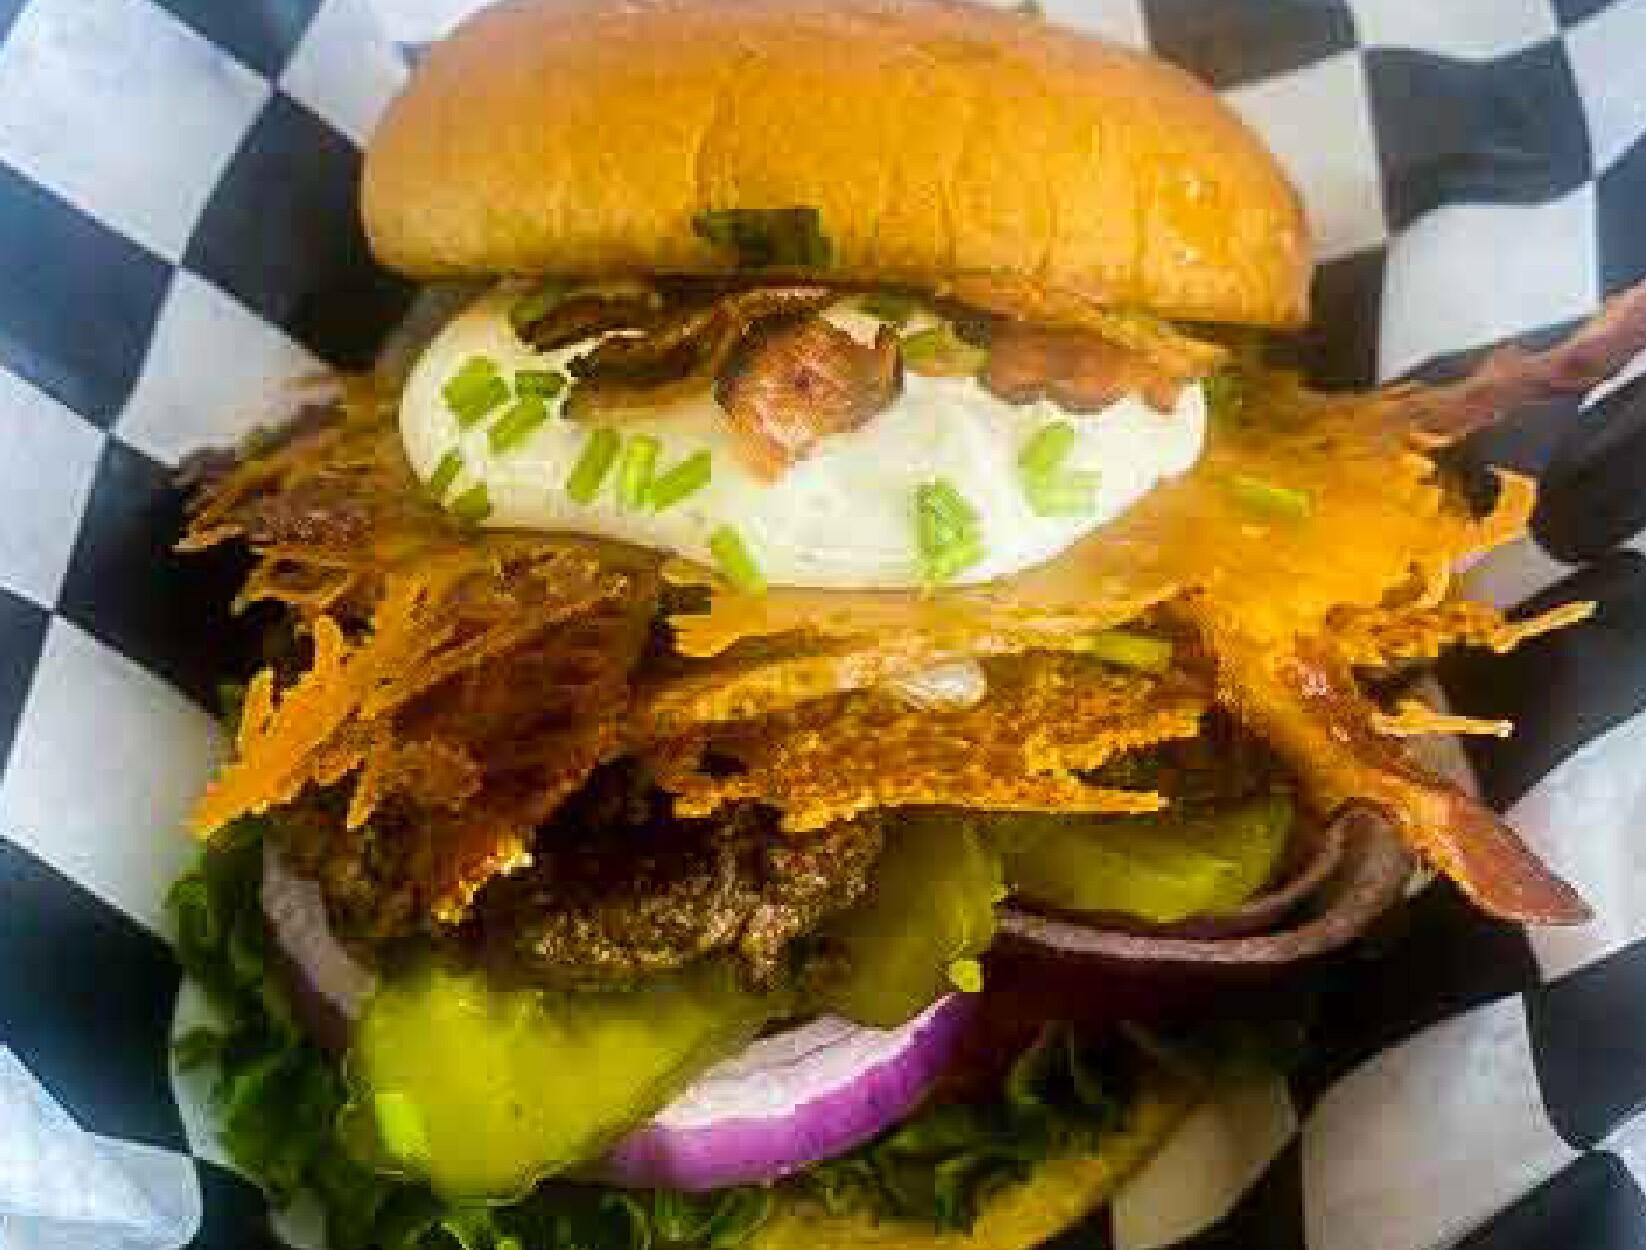 New-Food_Loaded-Tater-Burger.jpg